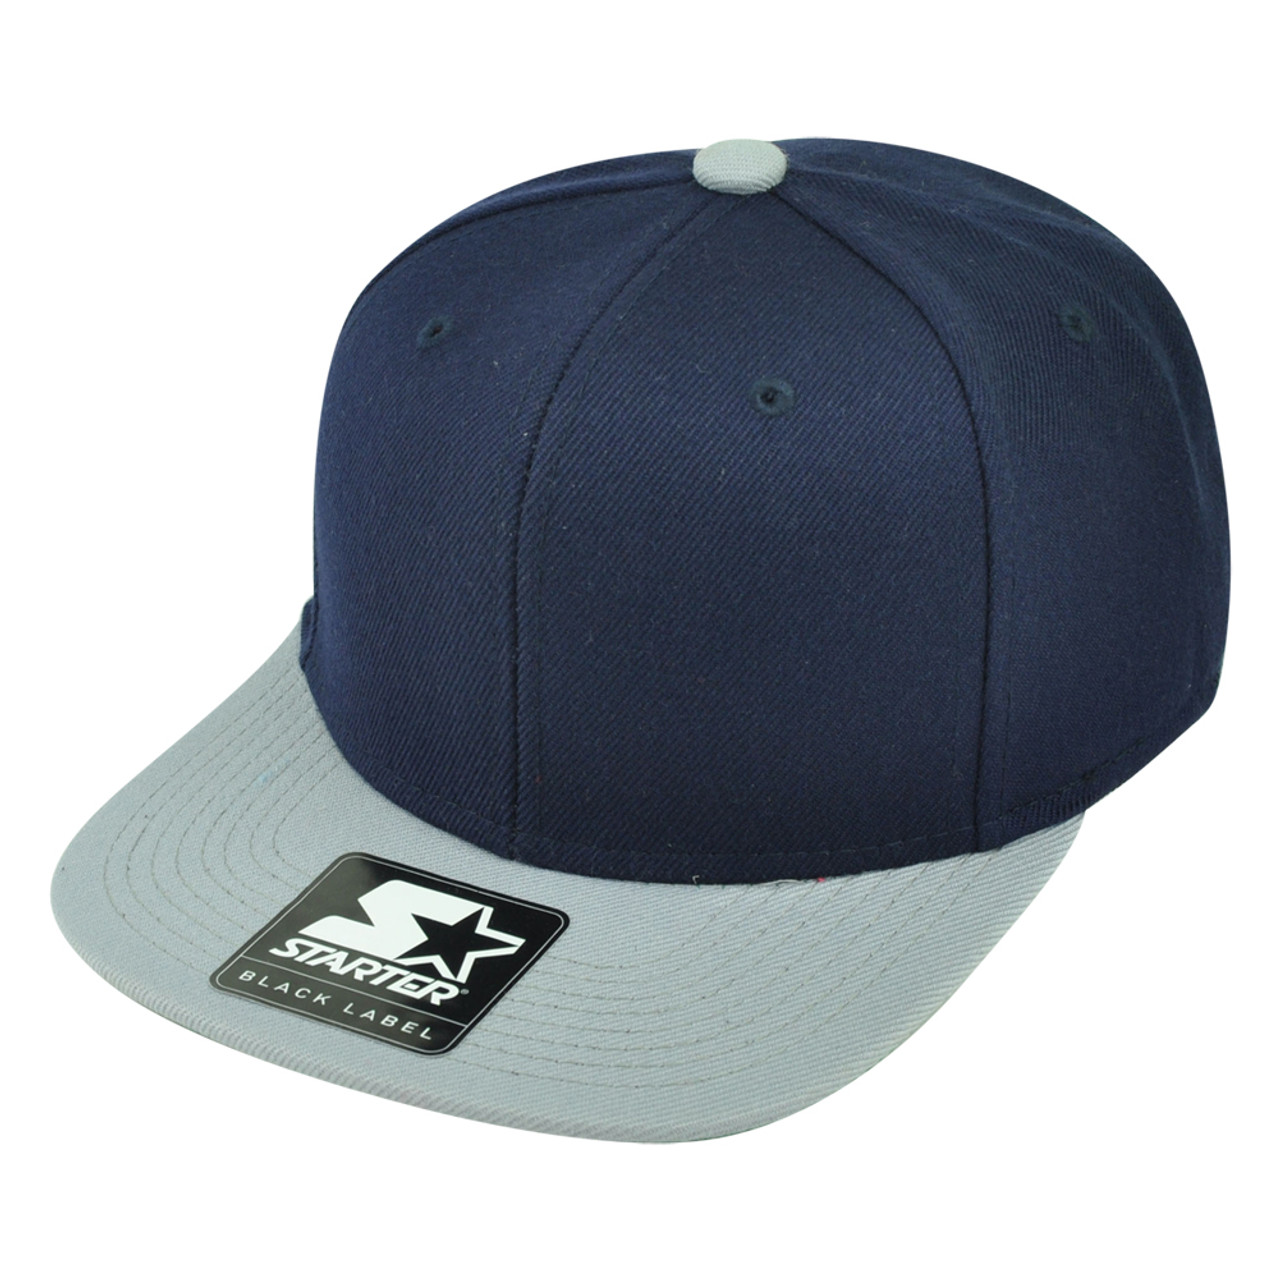 5a61b6711c7743 Starter Solid Plain Blank Flat Bill Snapback Hat Cap Adjustable 2 Tone Navy  Grey - Cap Store Online.com